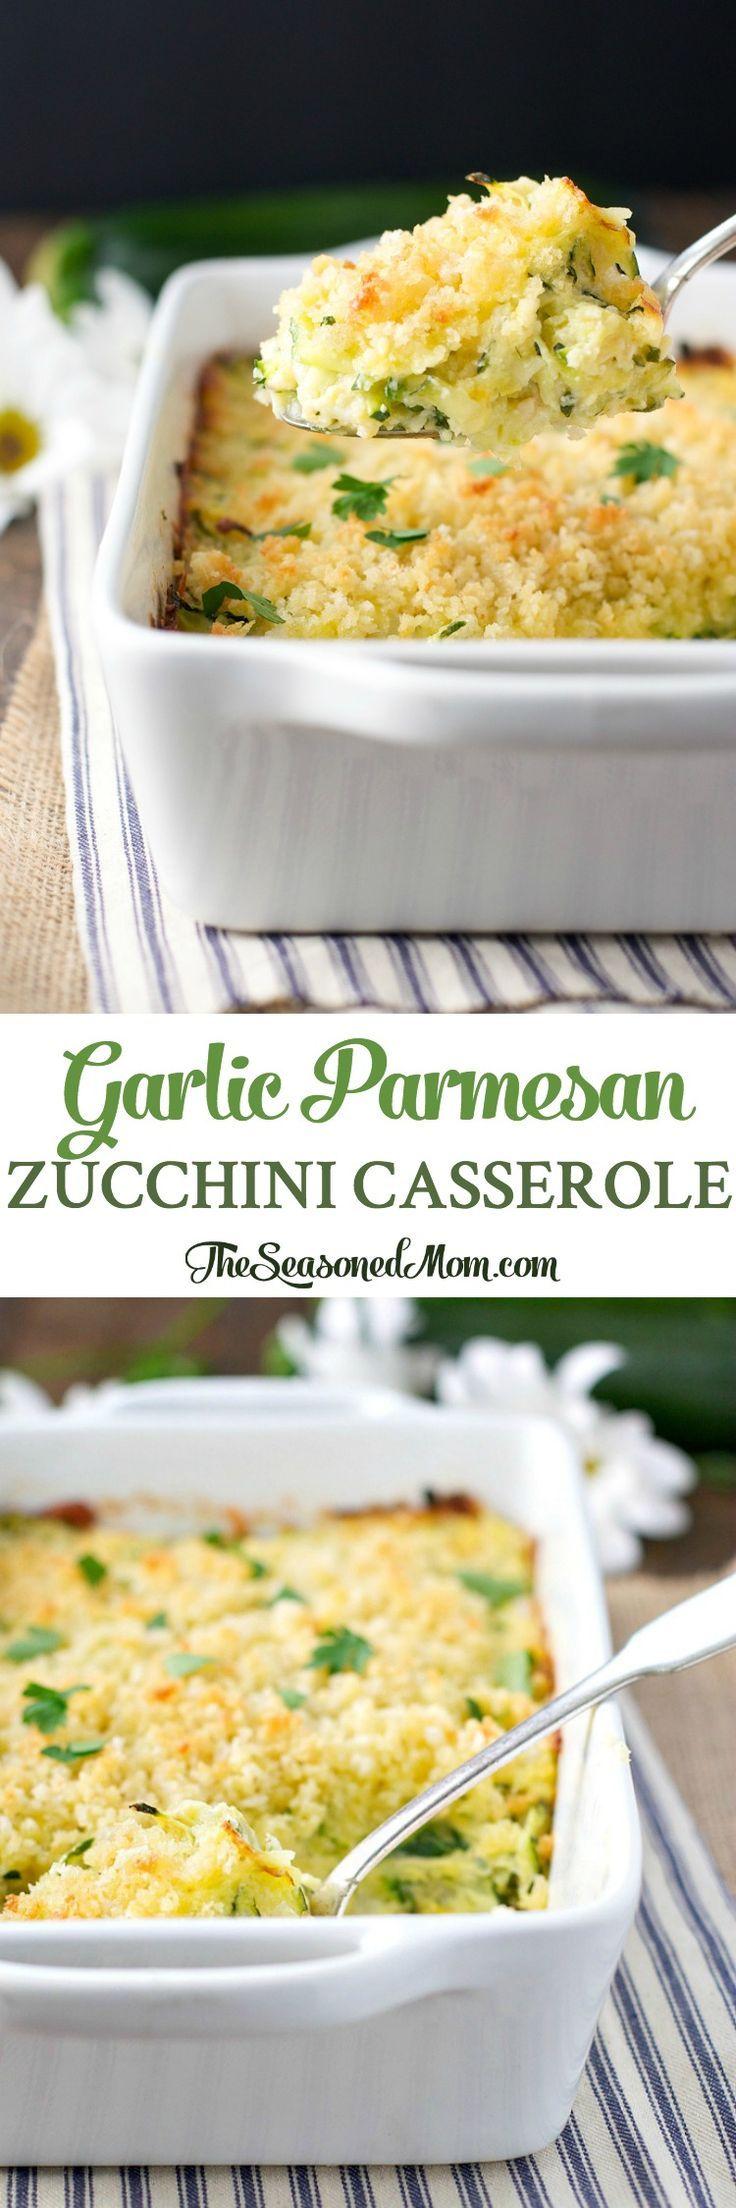 Garlic Parmesan Zucchini Casserole is an easy side dish! Zucchini Recipes | Sides | Side Dishes | Zucchini Recipes Baked | Side Dish Recipes #ad